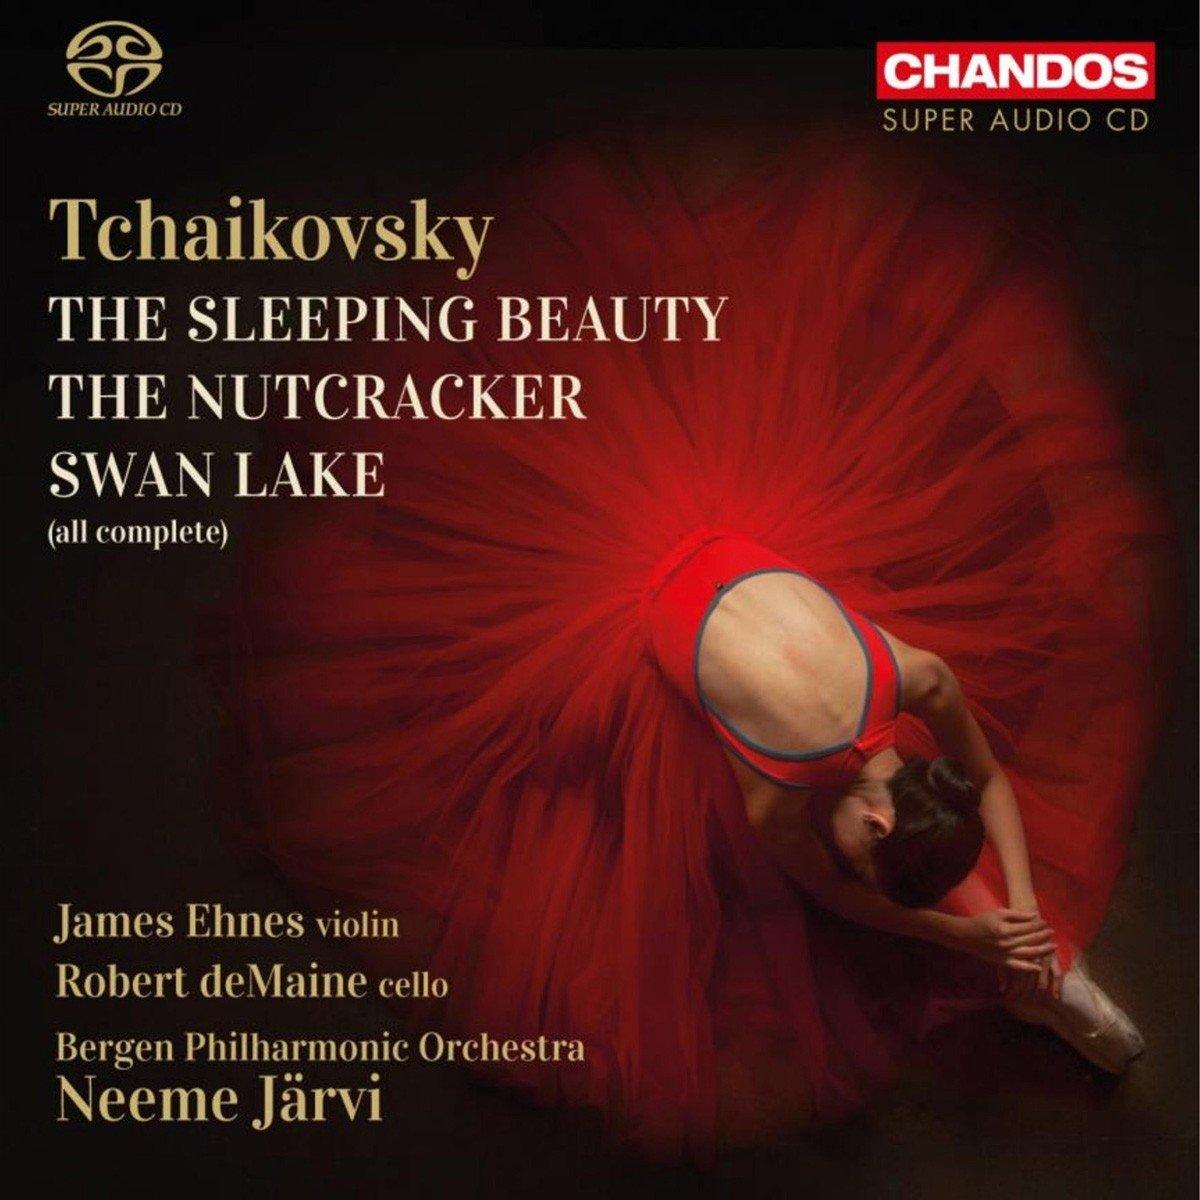 Tchaikovsky: The Sleeping Beauty, The Nutcracker, Swan Lake